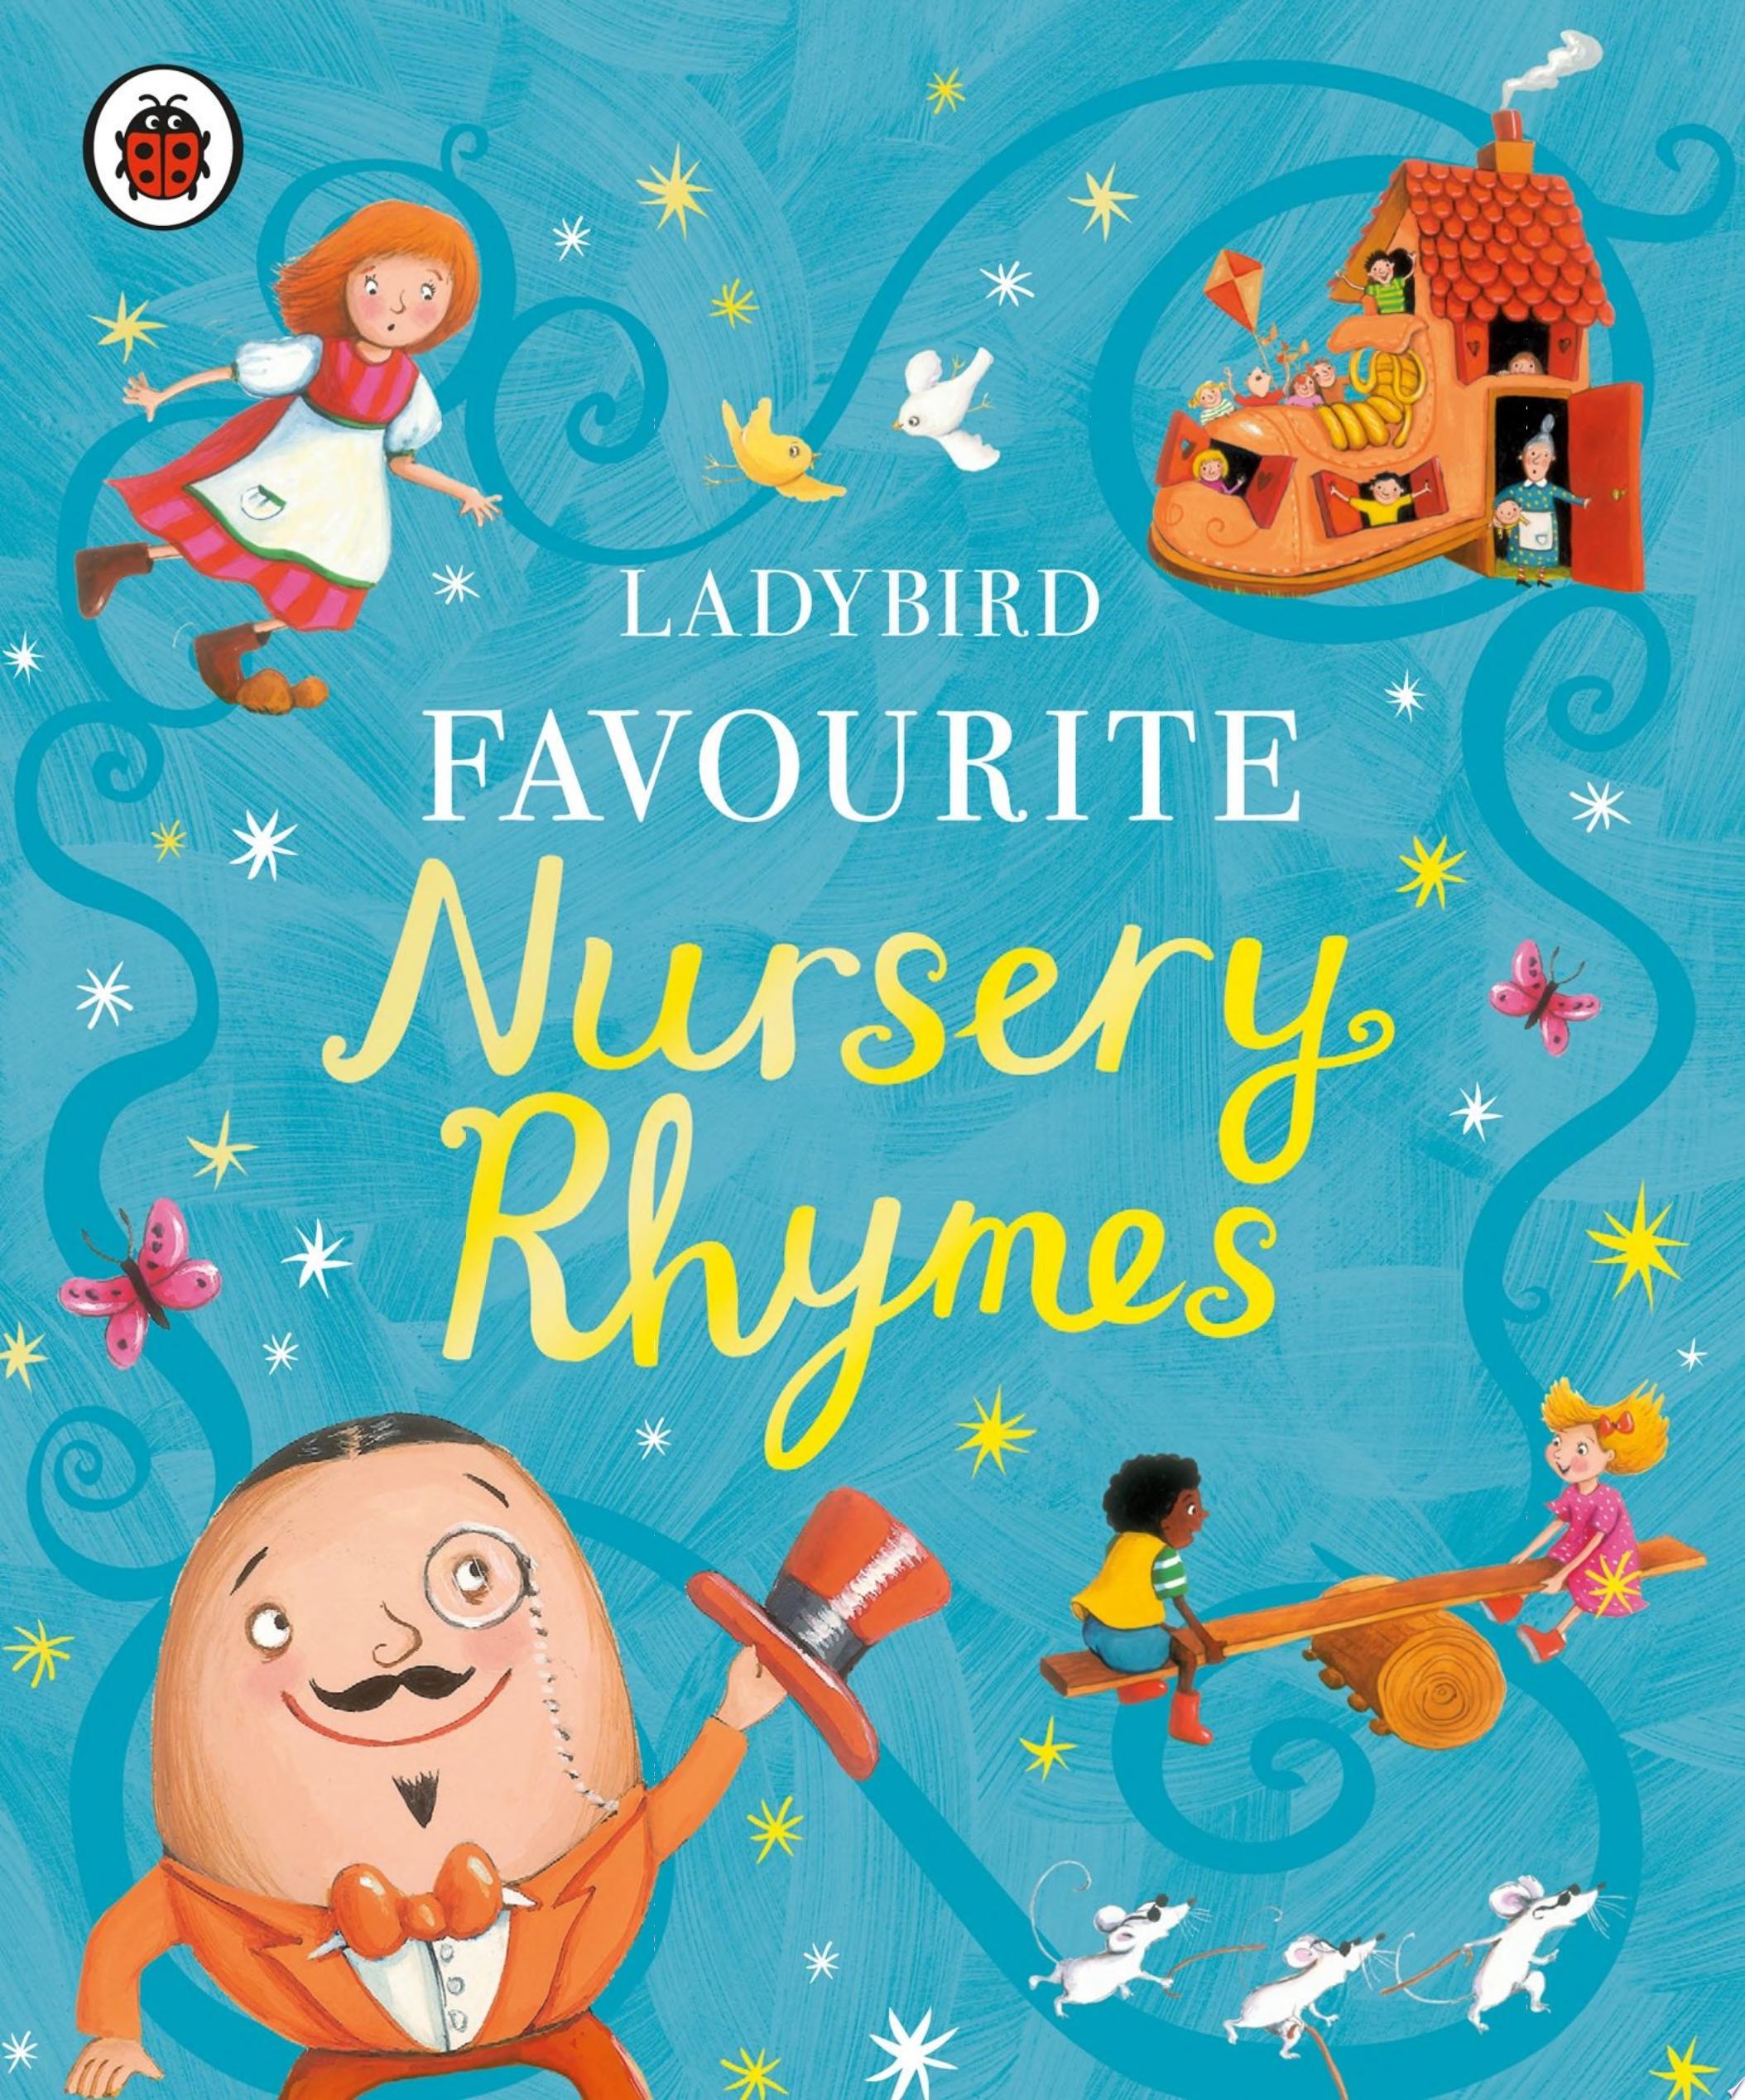 Ladybird Favourite Nursery Rhymes